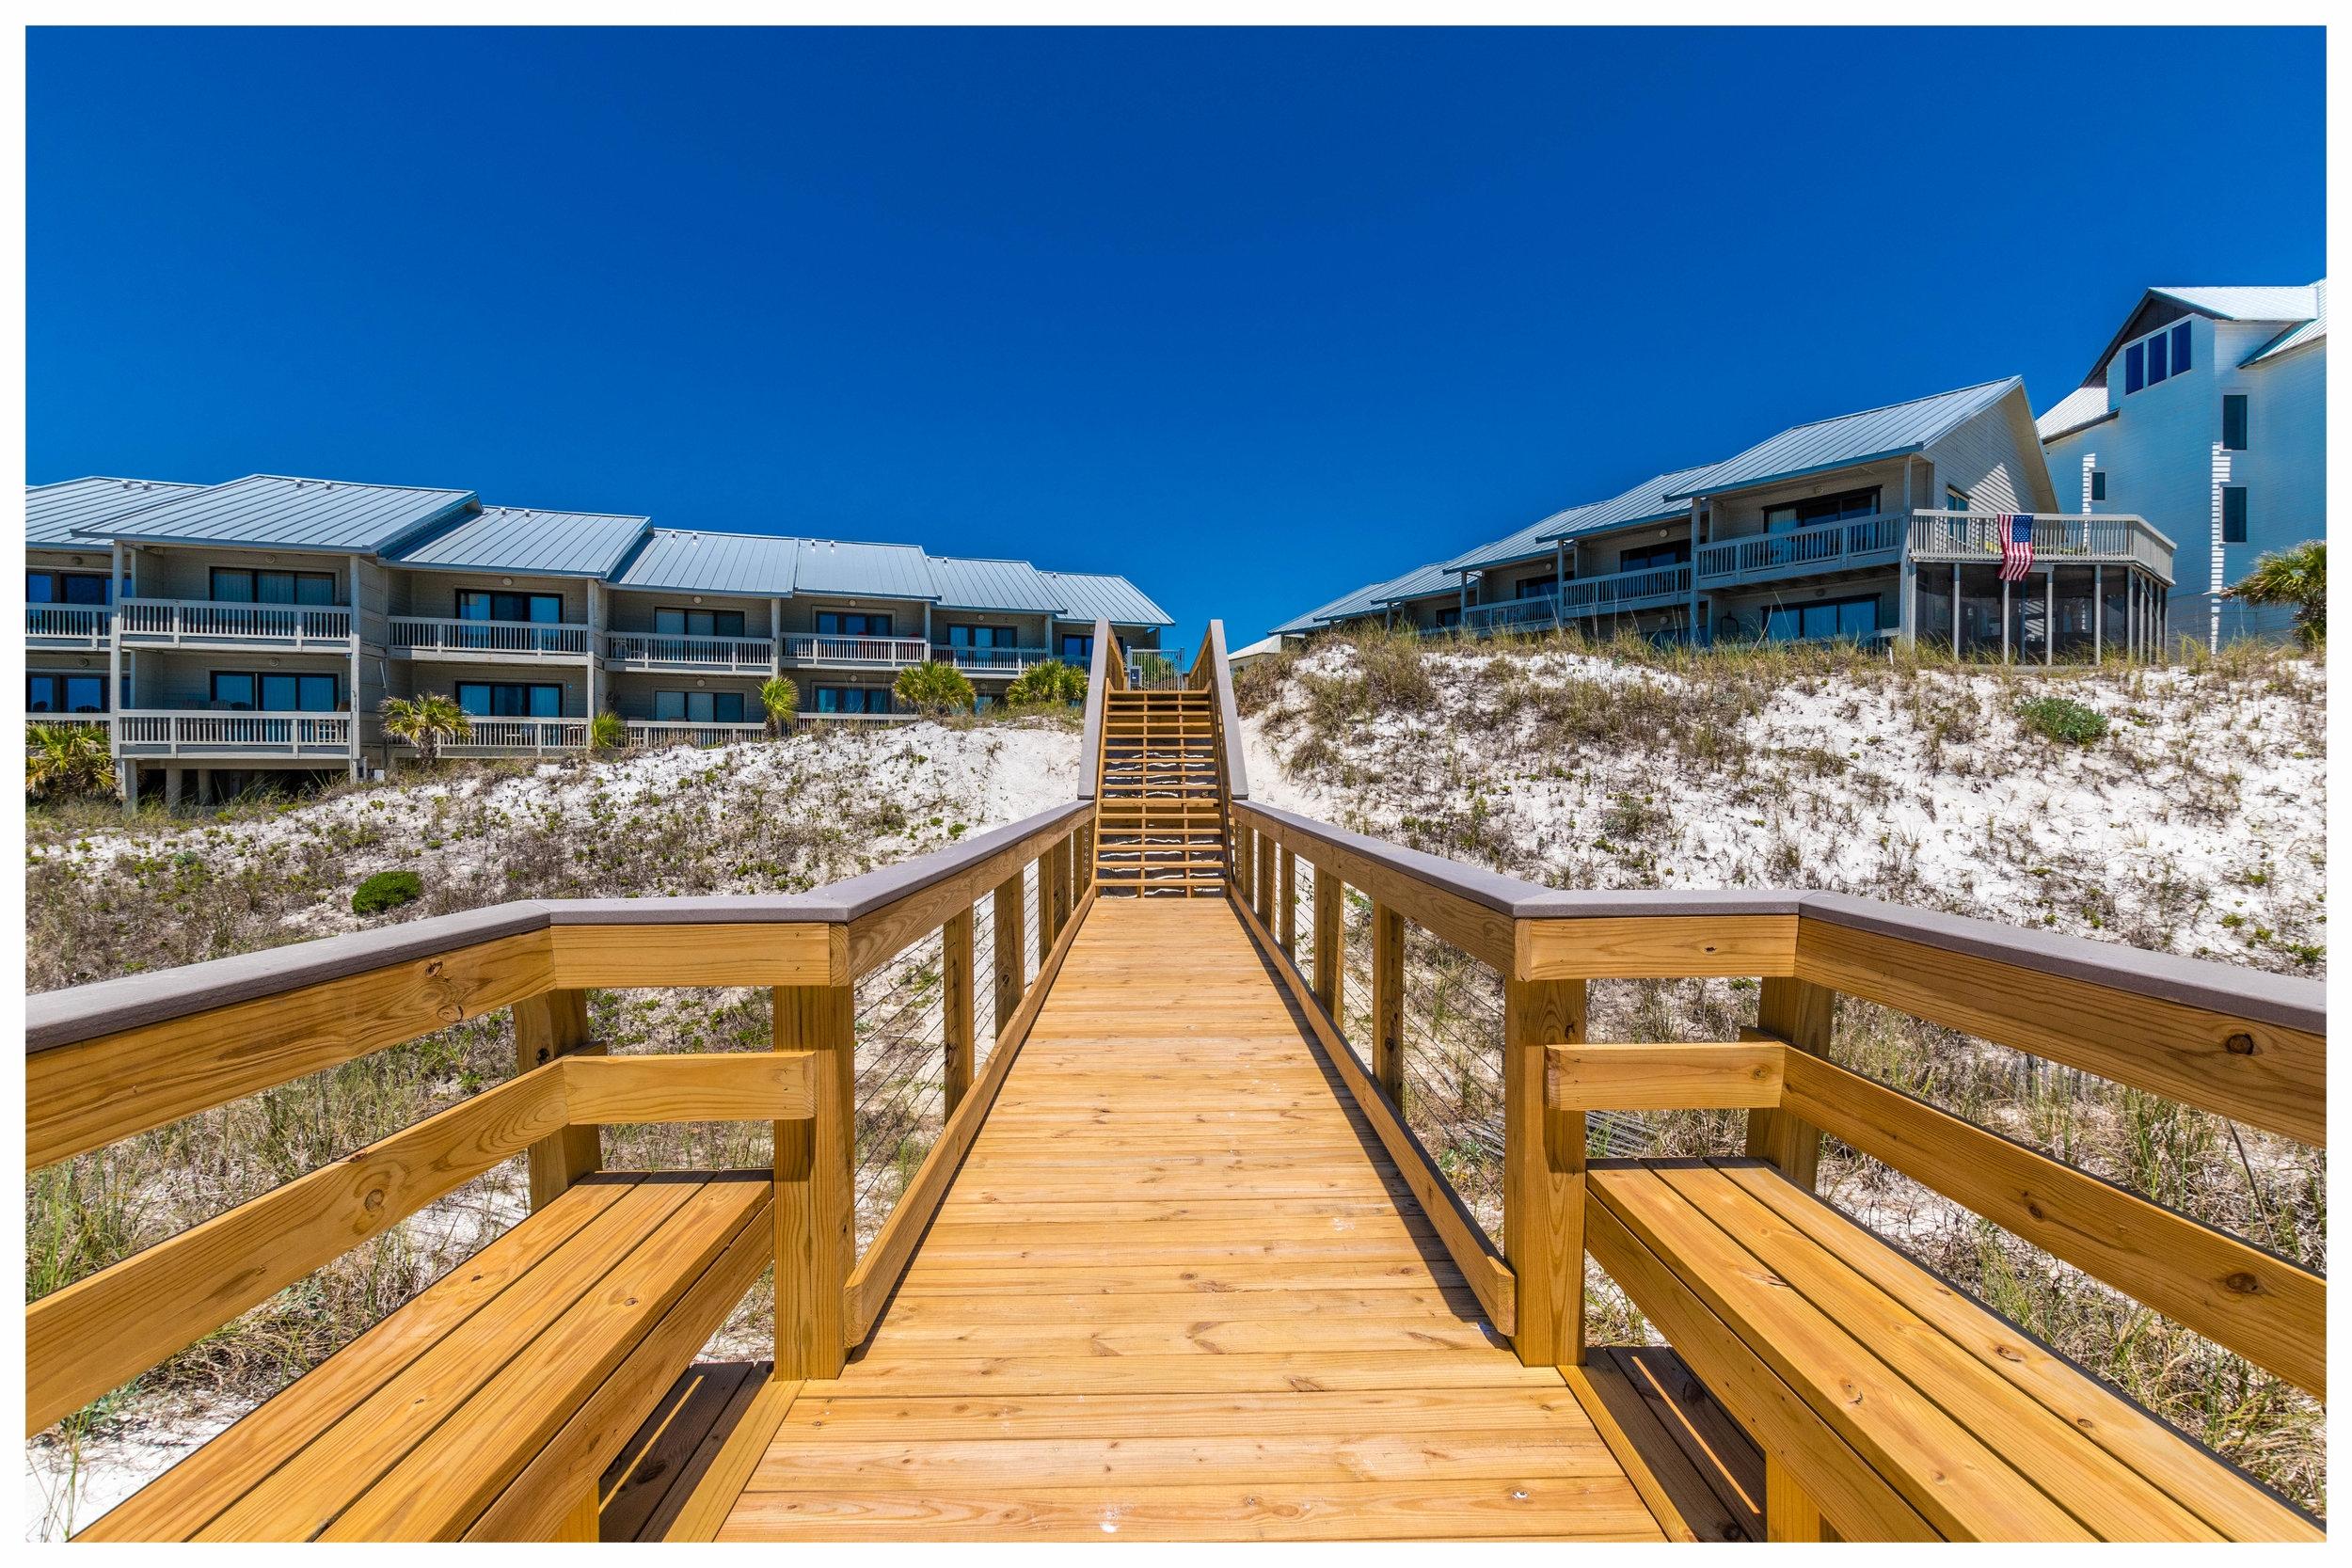 Pedestrian Boardwalk Design and Construction